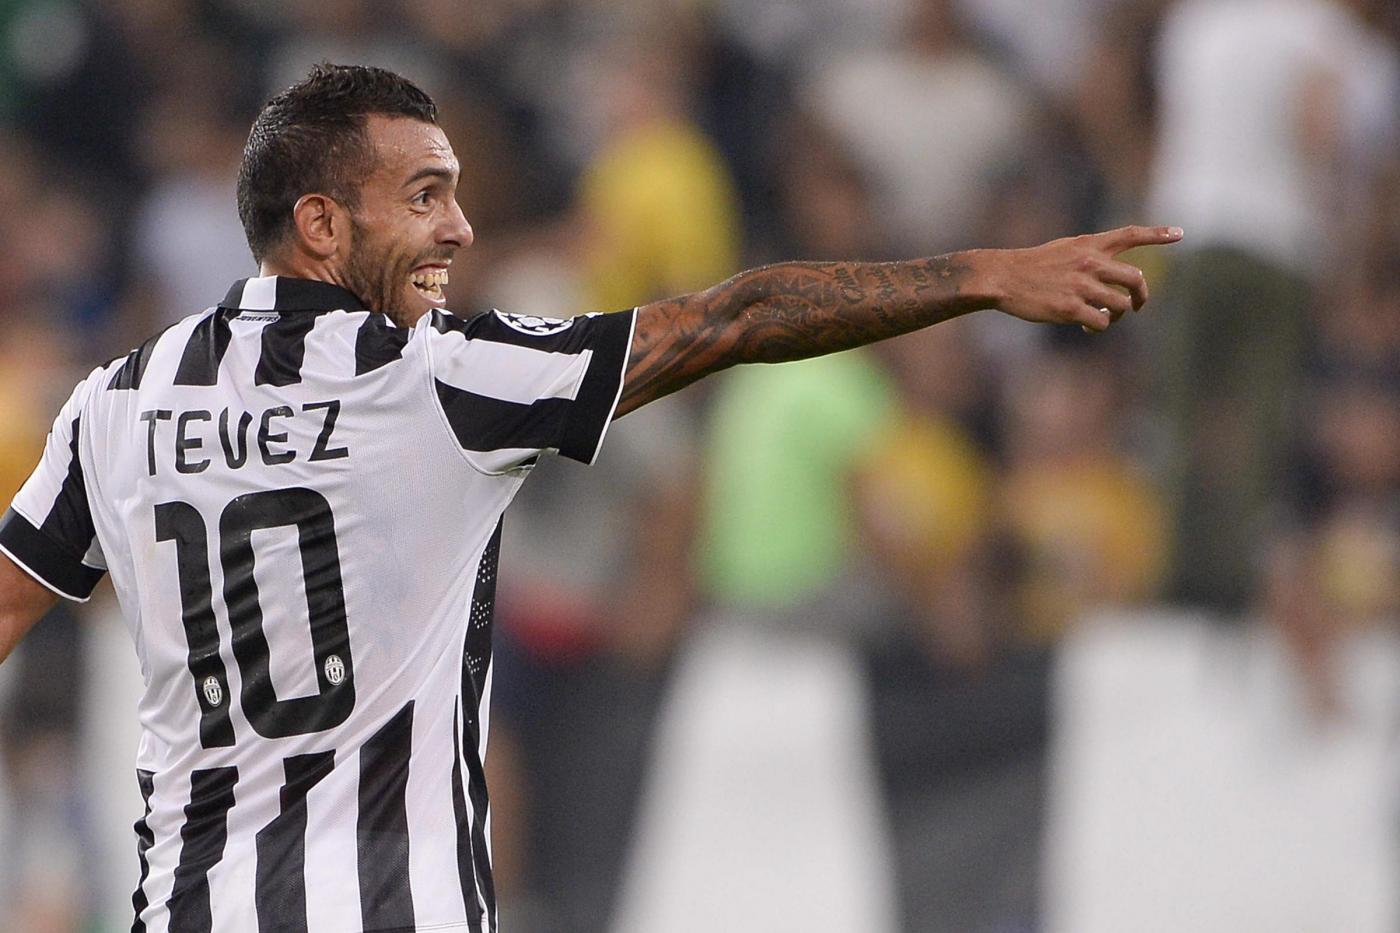 Juventus vs Malmö 2-0: doppio Tevez rompe il digiuno